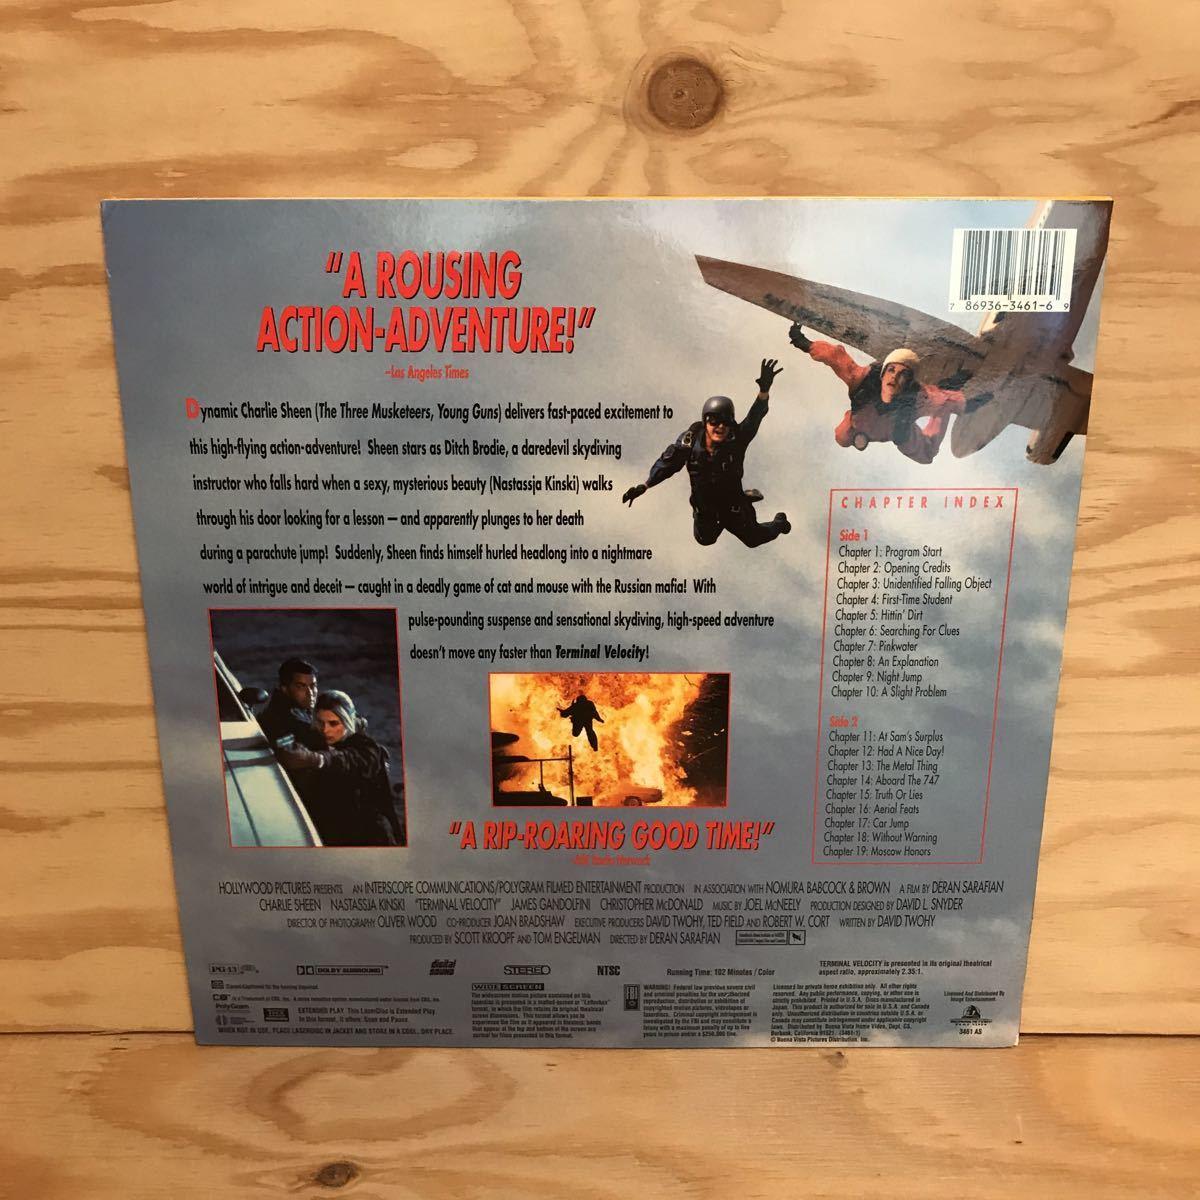 ◎K3FIID-200305 レア[TERMINAL VELOCITY]LD レーザーディスク NOMURA BABCOCK&BROWN チャーリー・シーン_画像2